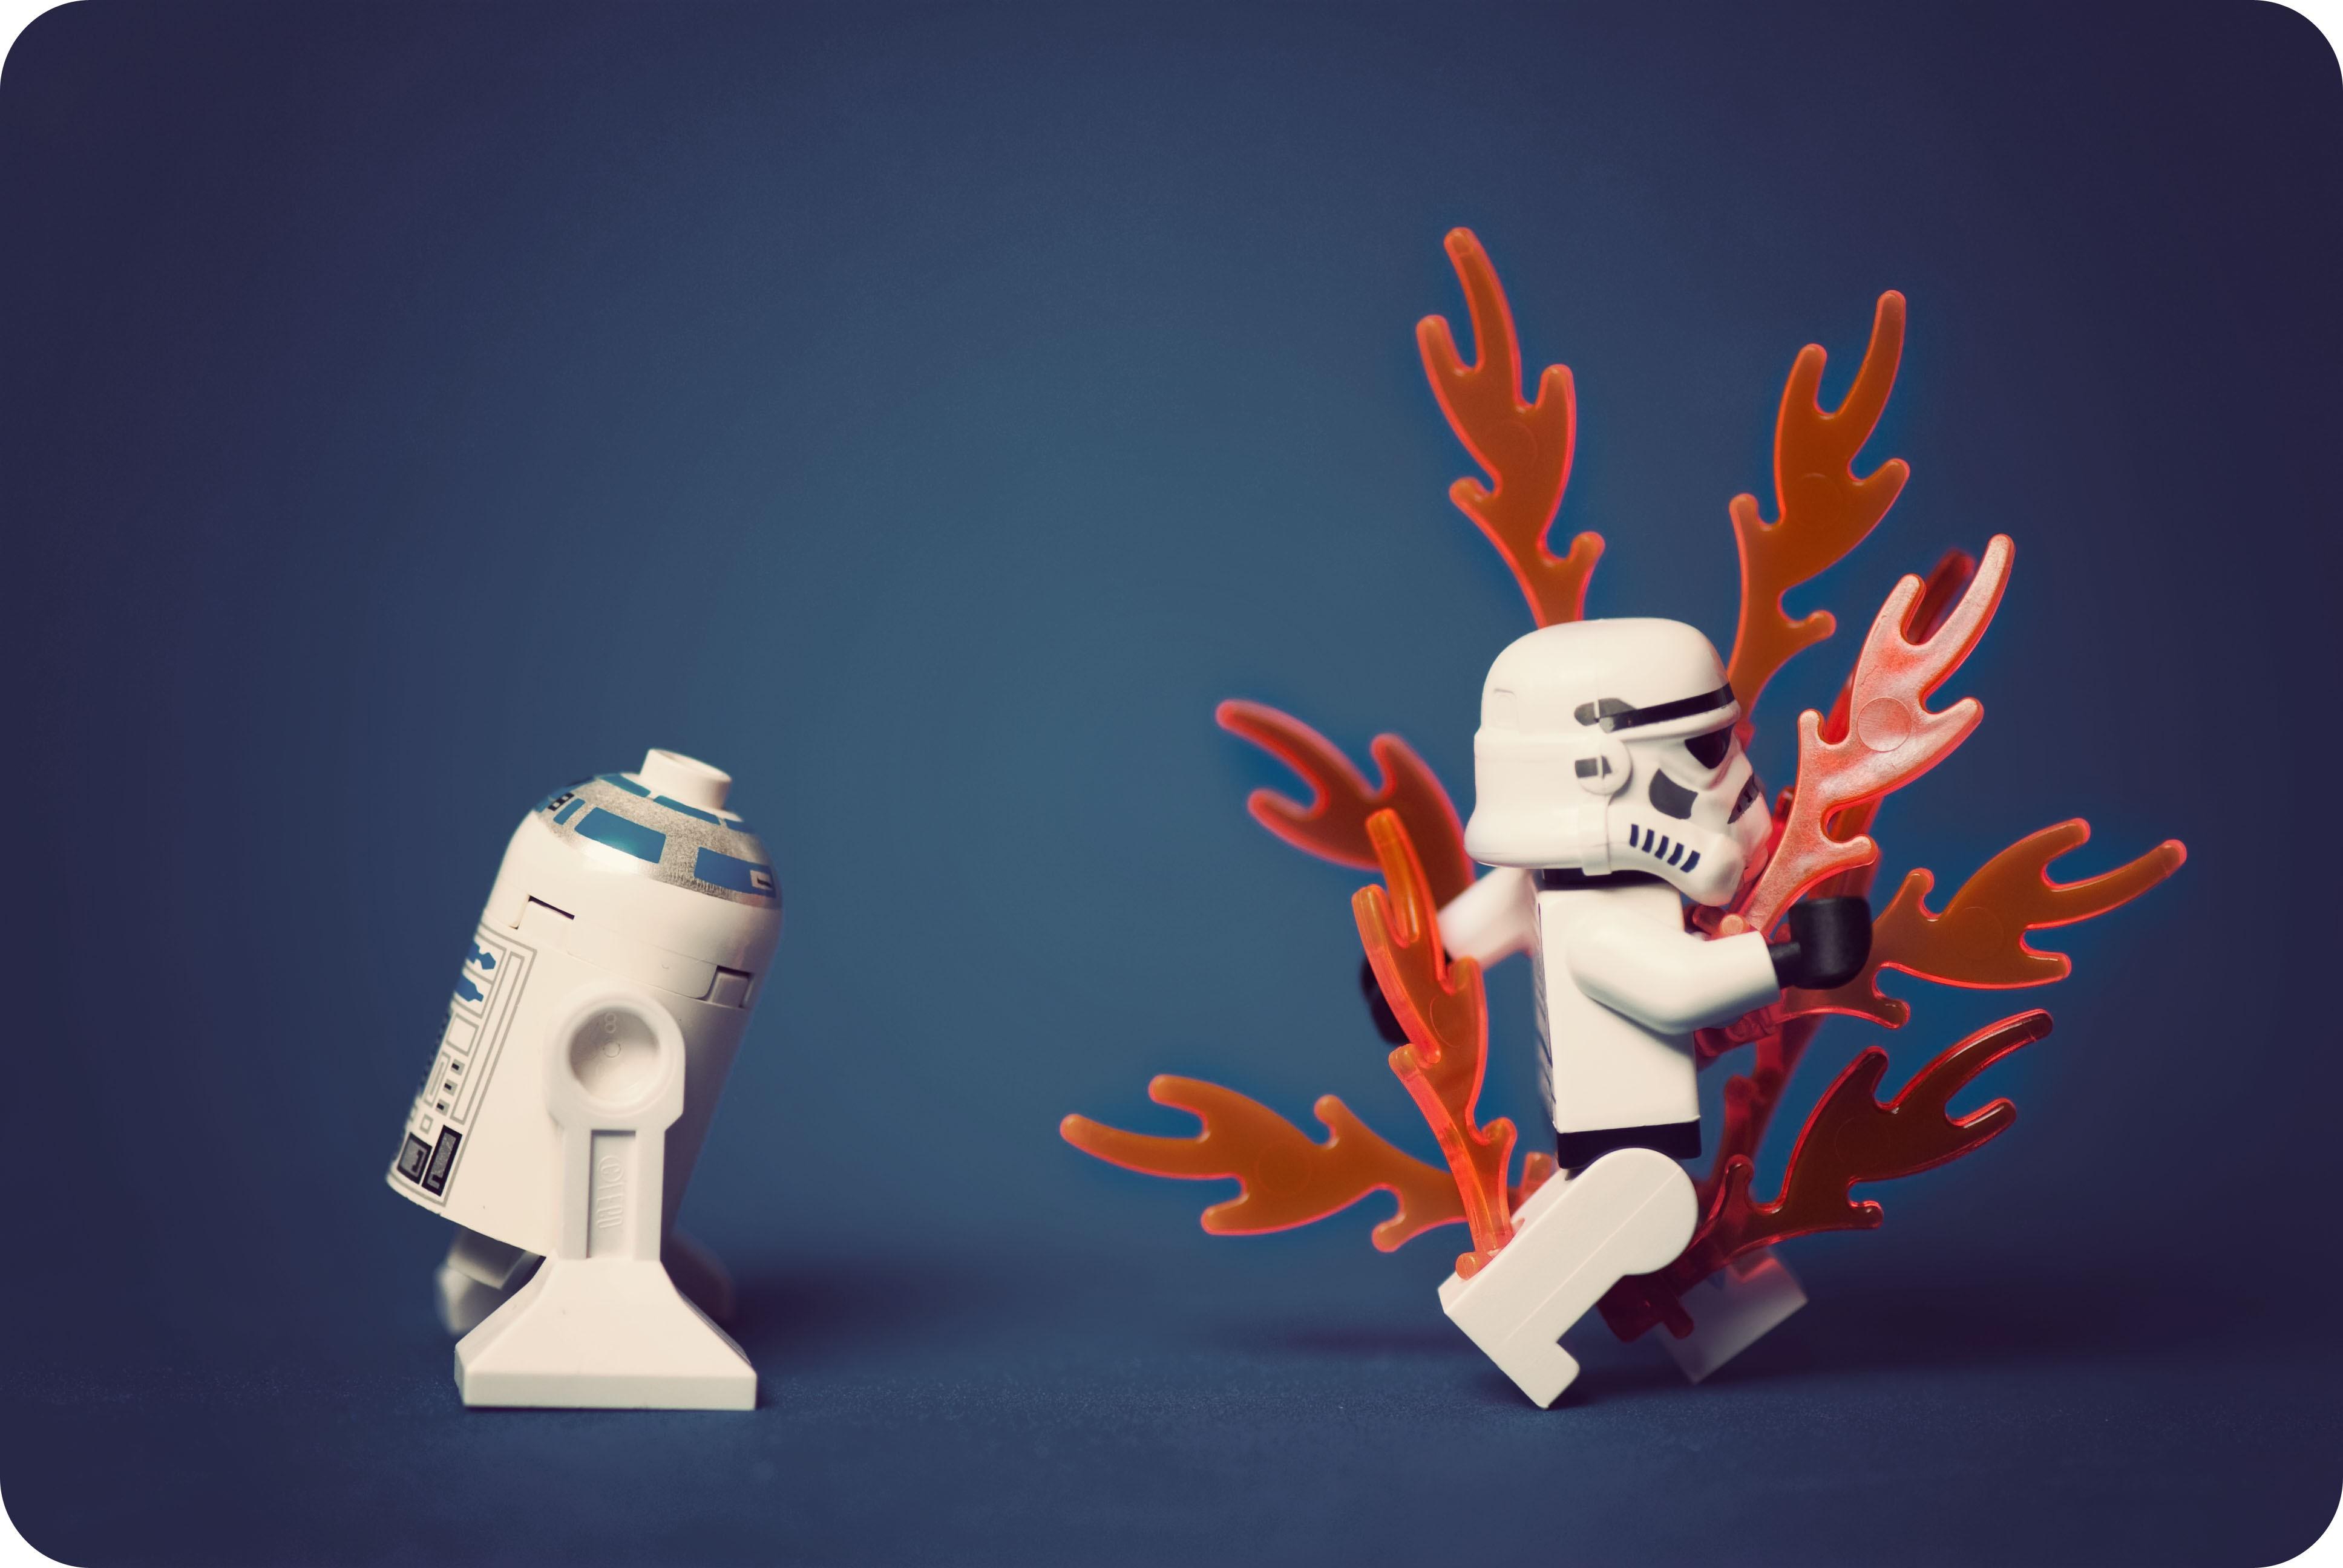 Lego, Star Wars Wallpapers Hd / Desktop And Mobile - Illustration , HD Wallpaper & Backgrounds